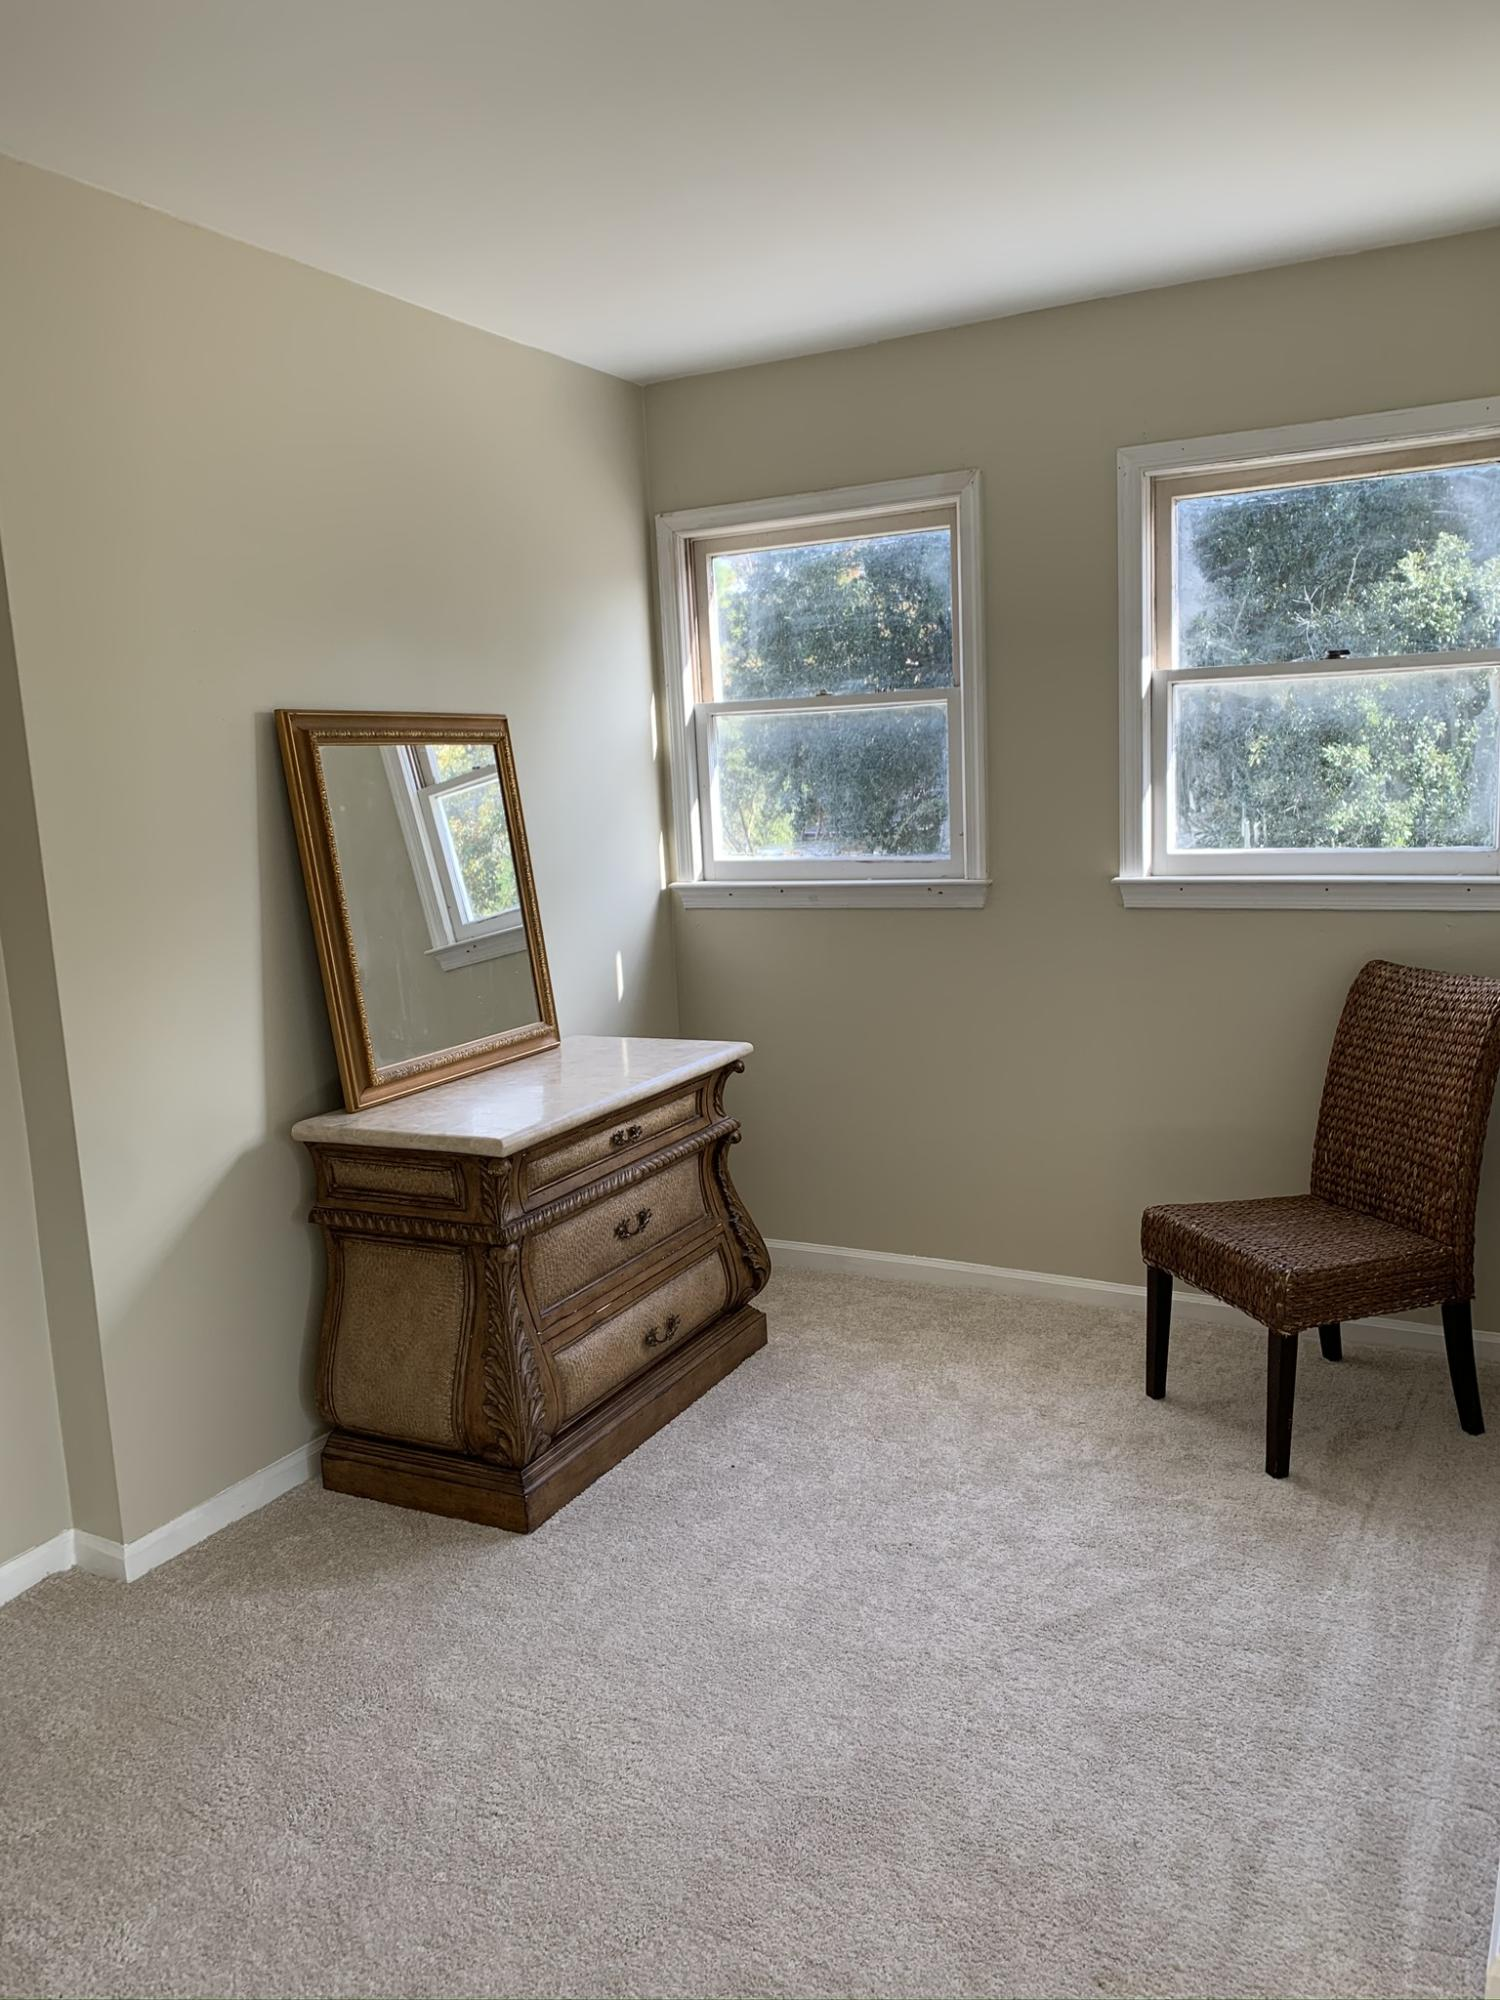 Fox Pond Homes For Sale - 662 Poaug, Mount Pleasant, SC - 0